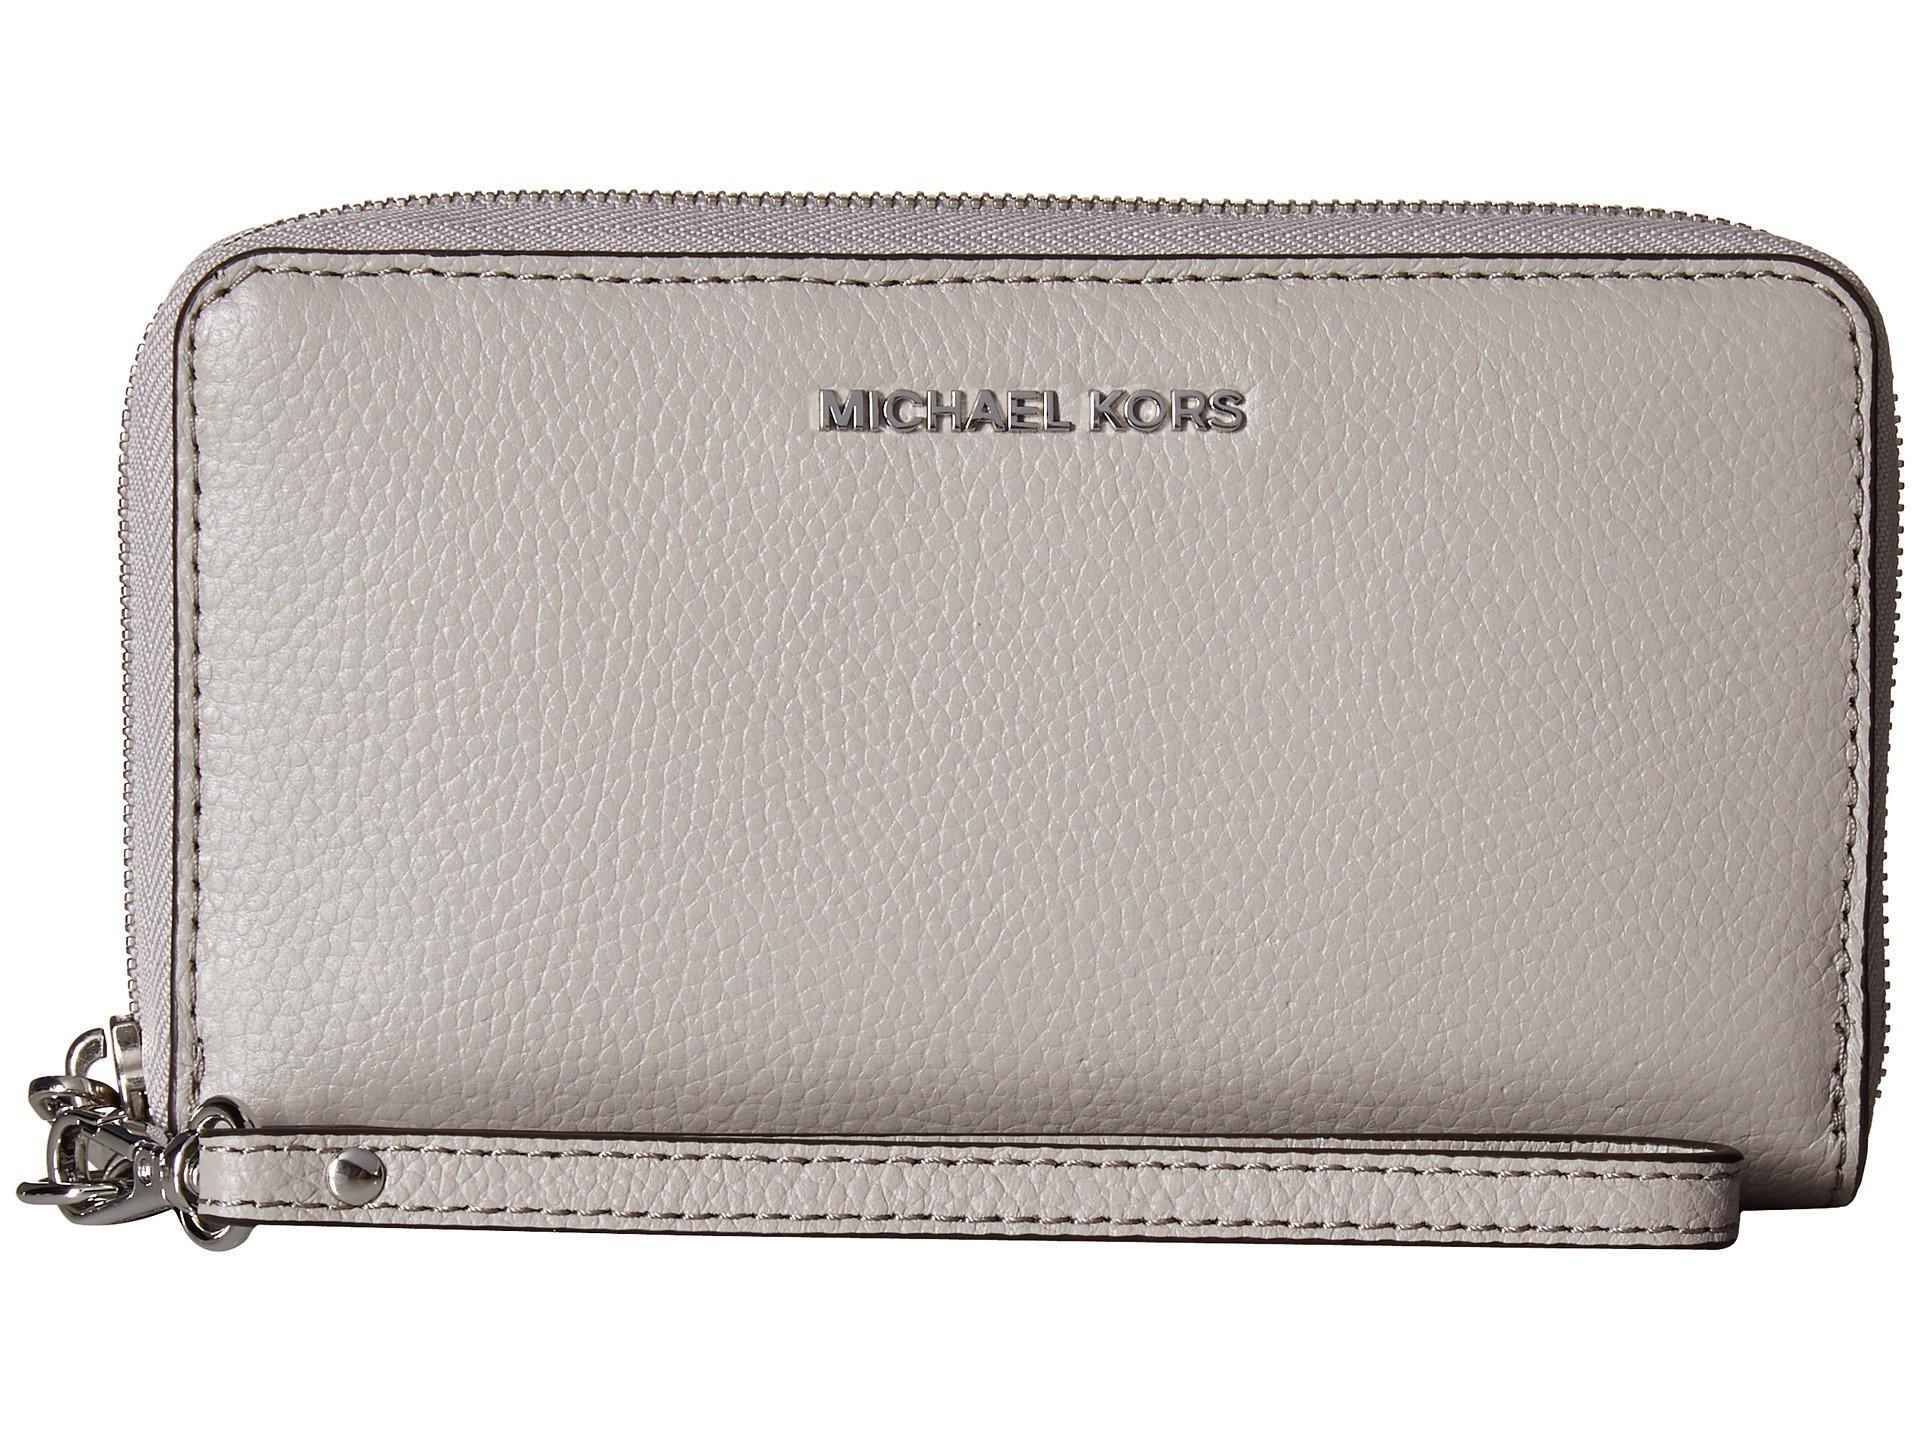 MICHAEL Michael Kors KORS STUDIO Large Flat Phone Case Wristlet Pearl Gray